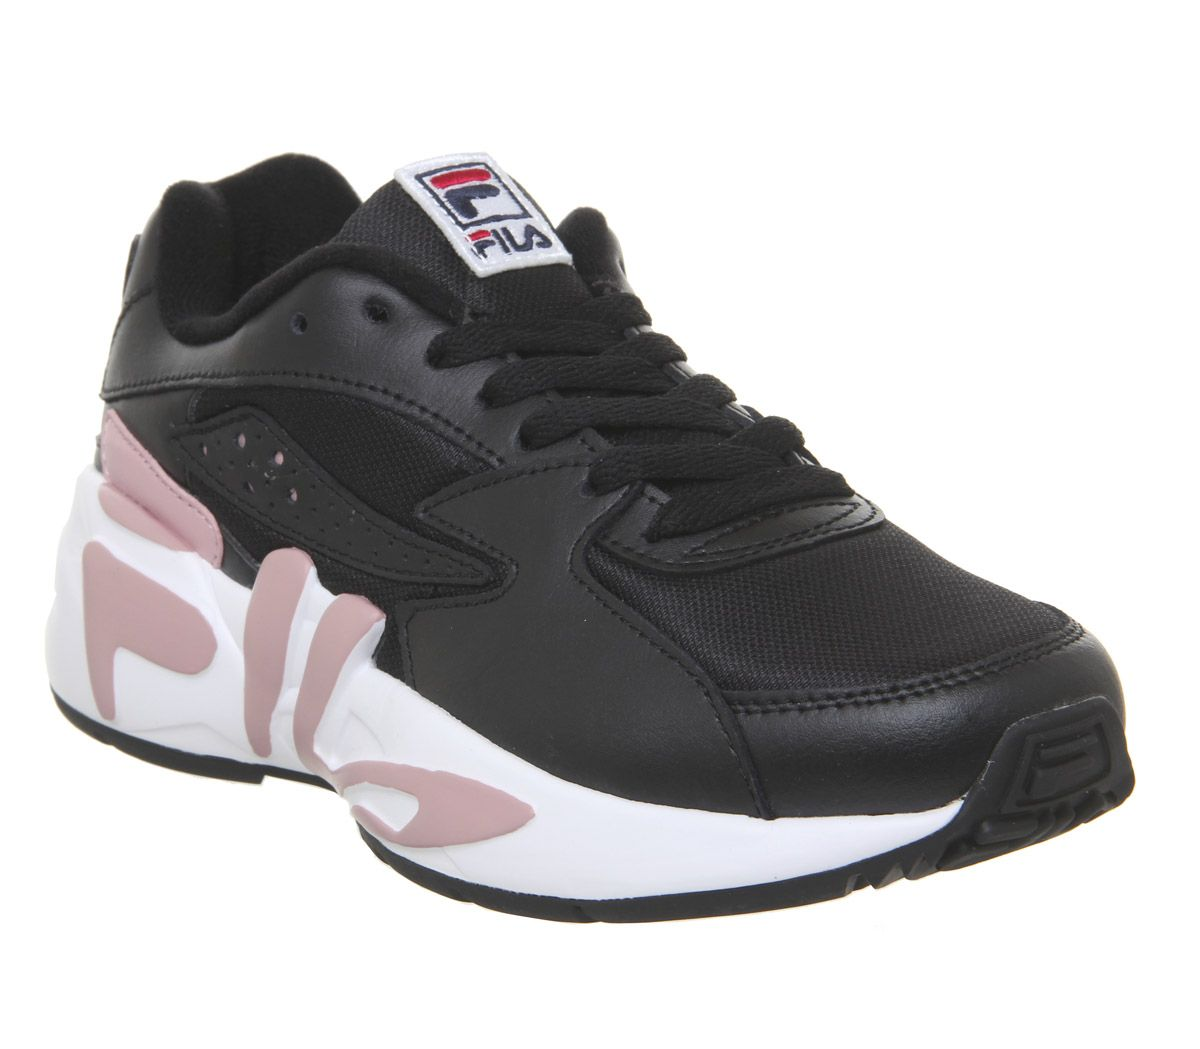 scarpe sportive 814c6 5c3e1 Dettagli su Donna Fila Mindblower Scarpe Sportive Bianco Rosa Ombra Bianche  Sportive Scarpe